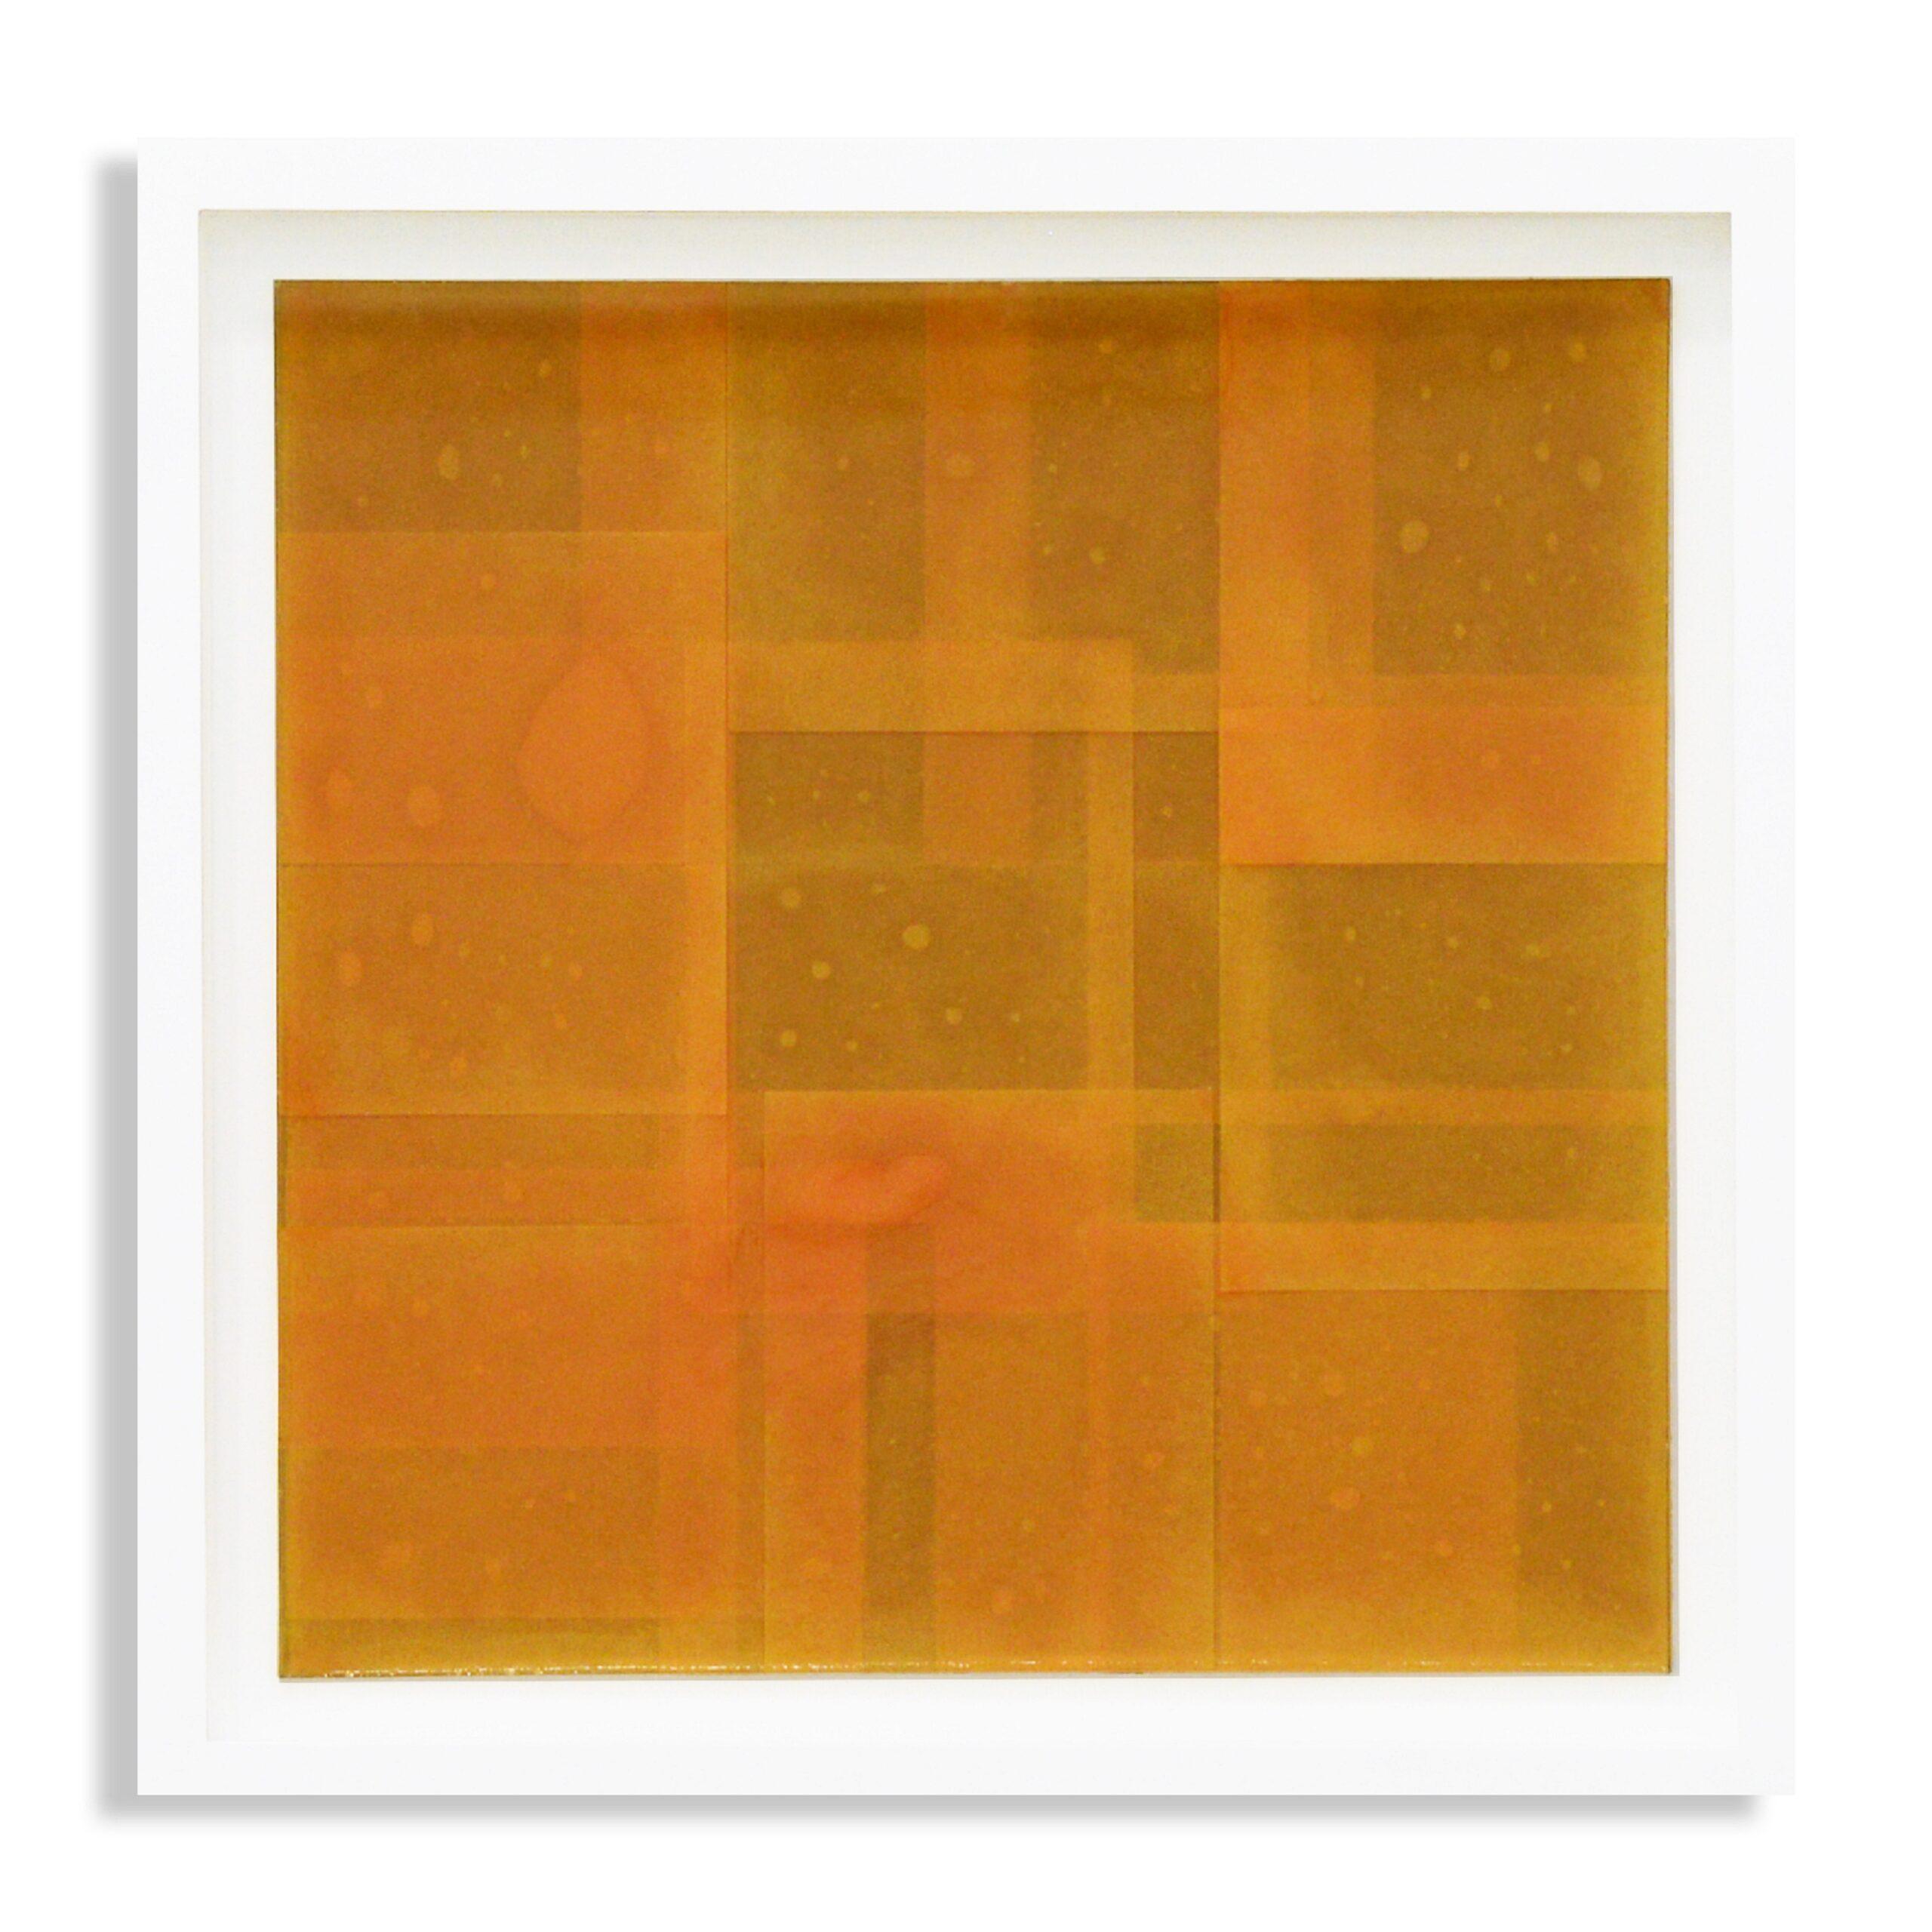 Julian Cording - On the perfection underlying life orange